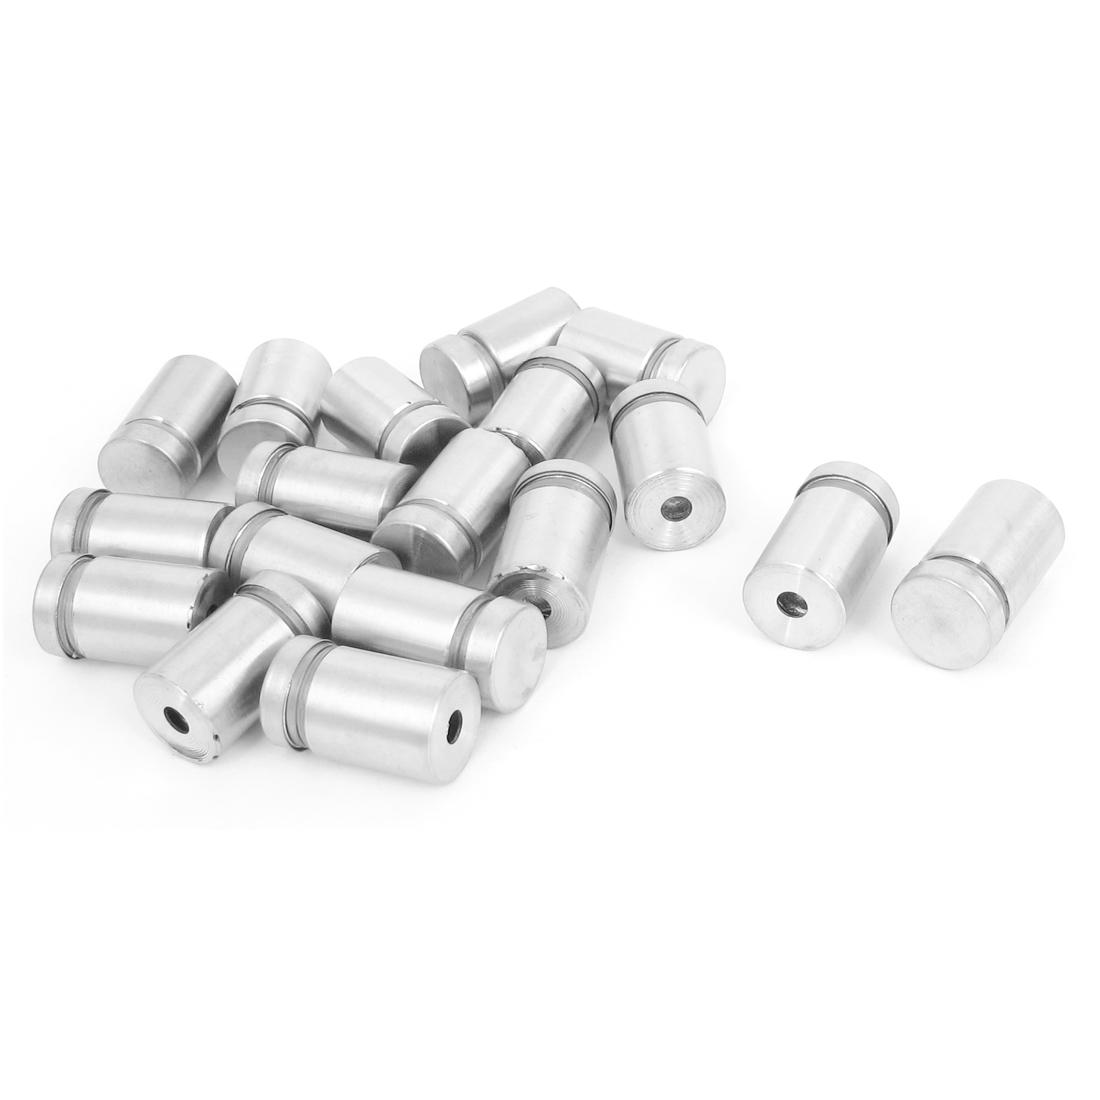 16mm x 25mm Stainless Steel Advertising Frameless Glass Standoff Pins 18pcs